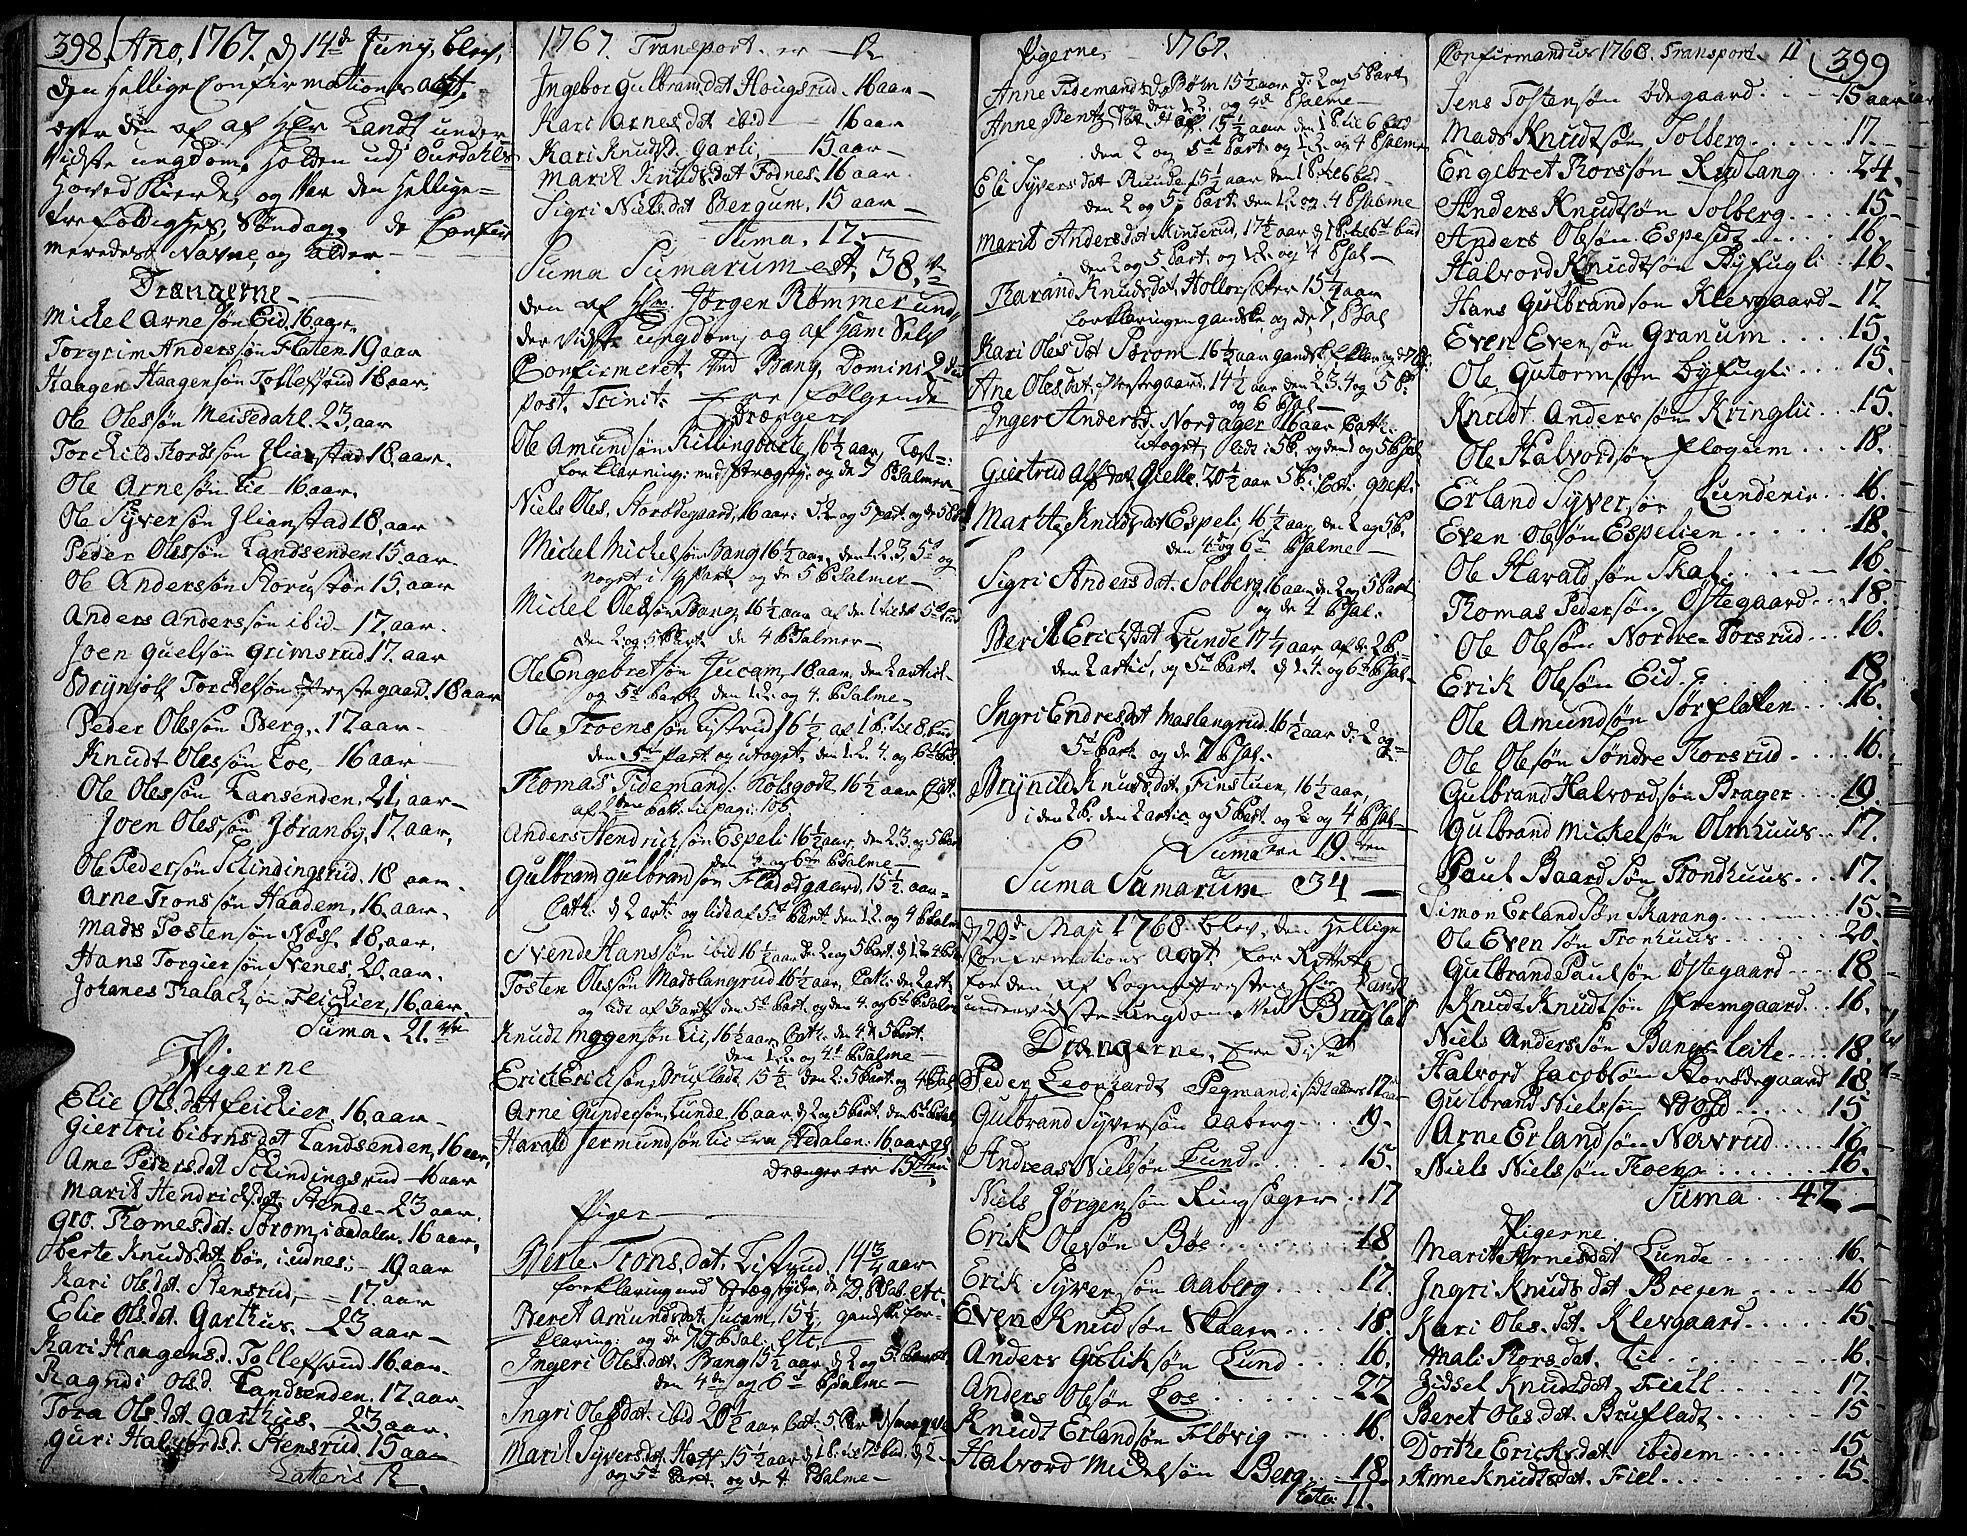 SAH, Aurdal prestekontor, Ministerialbok nr. 5, 1763-1781, s. 398-399